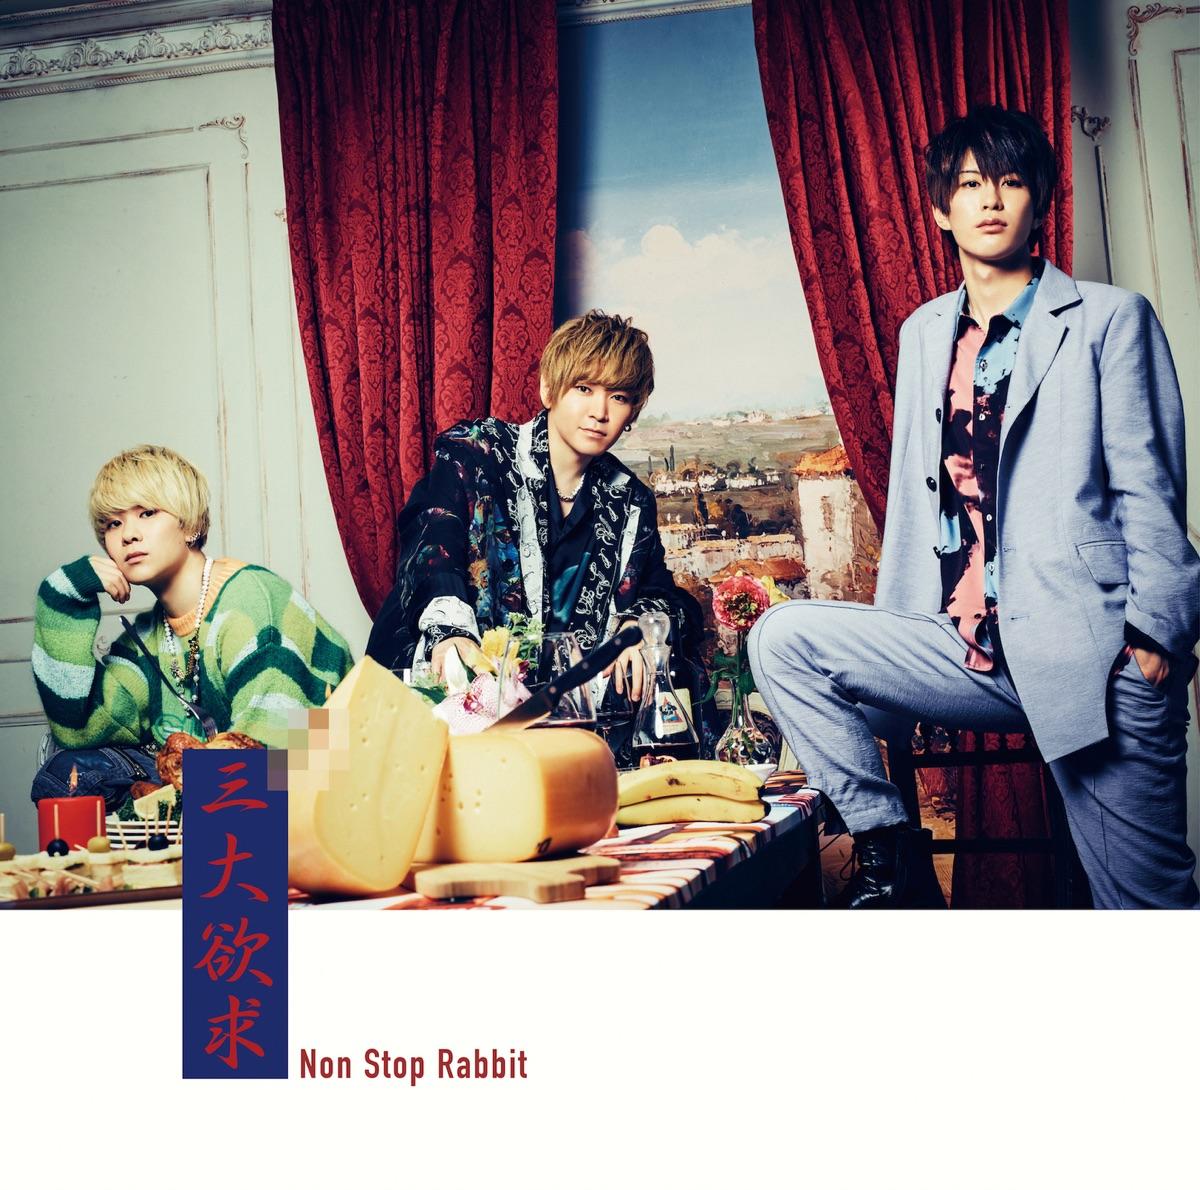 Cover for『Non Stop Rabbit - Sandai Yokkyuu』from the release『Sandai Yokkyuu』